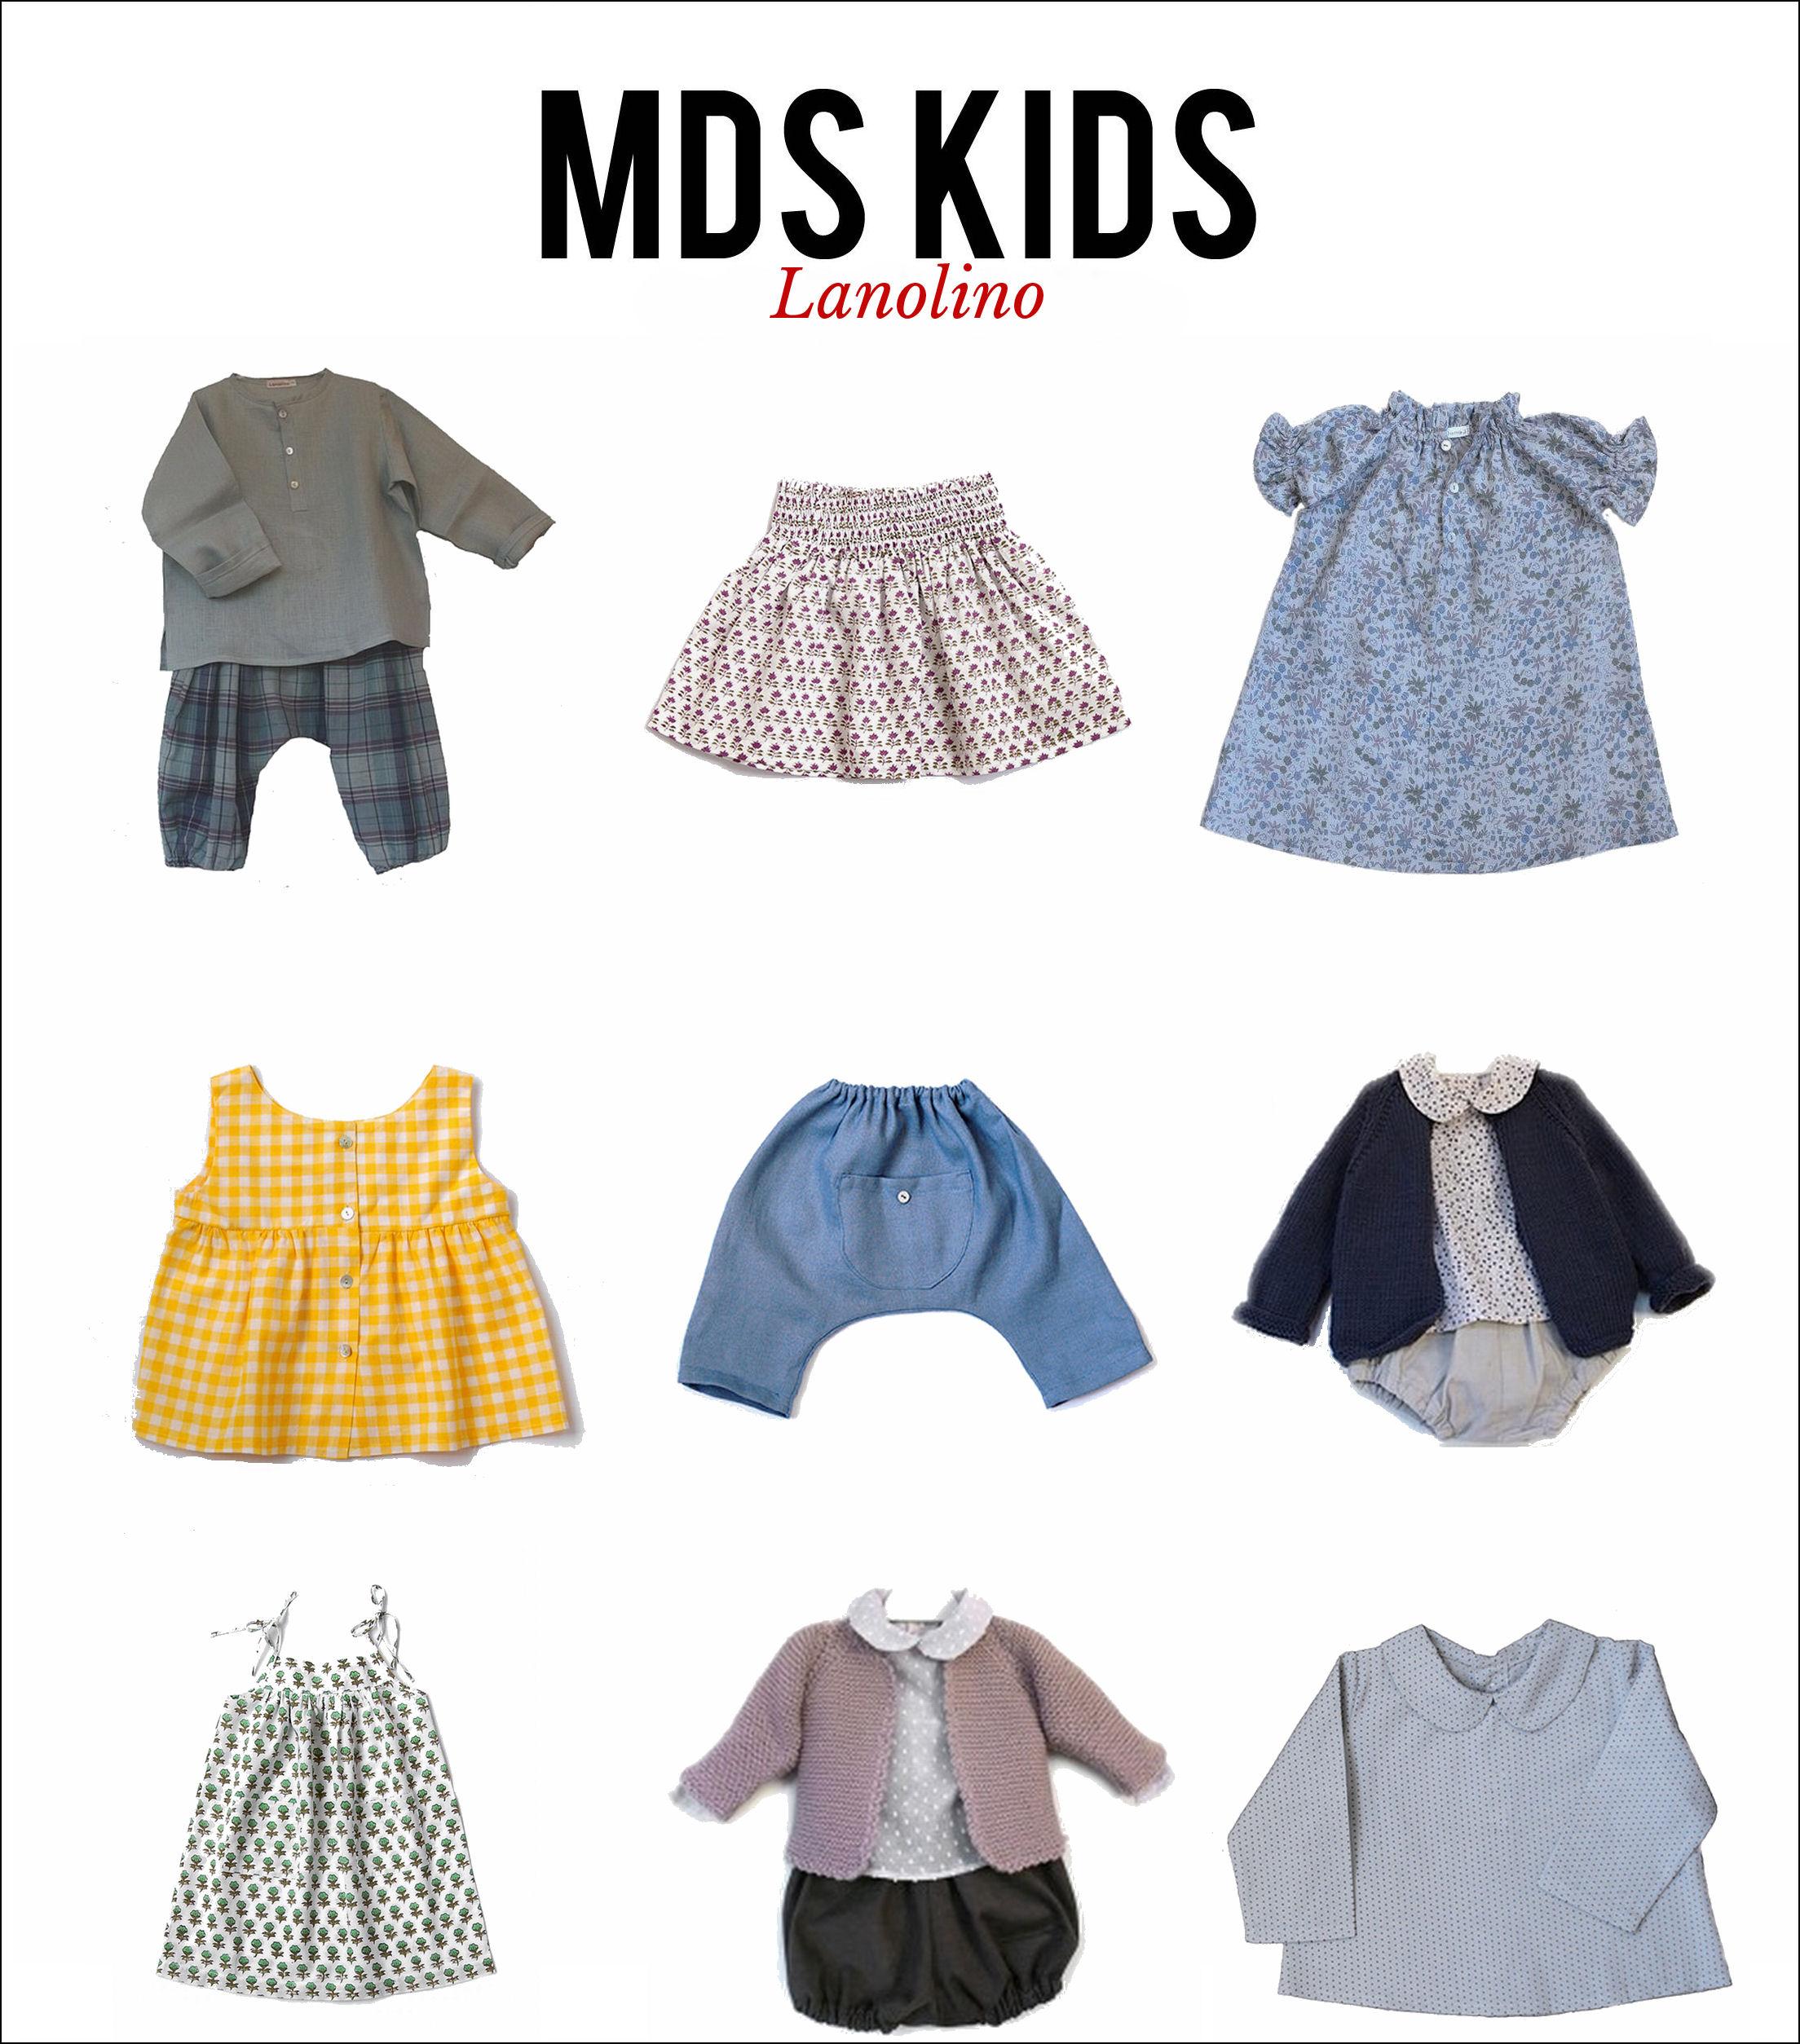 MDS KIDS: LANOLINO-60551-mydailystyle